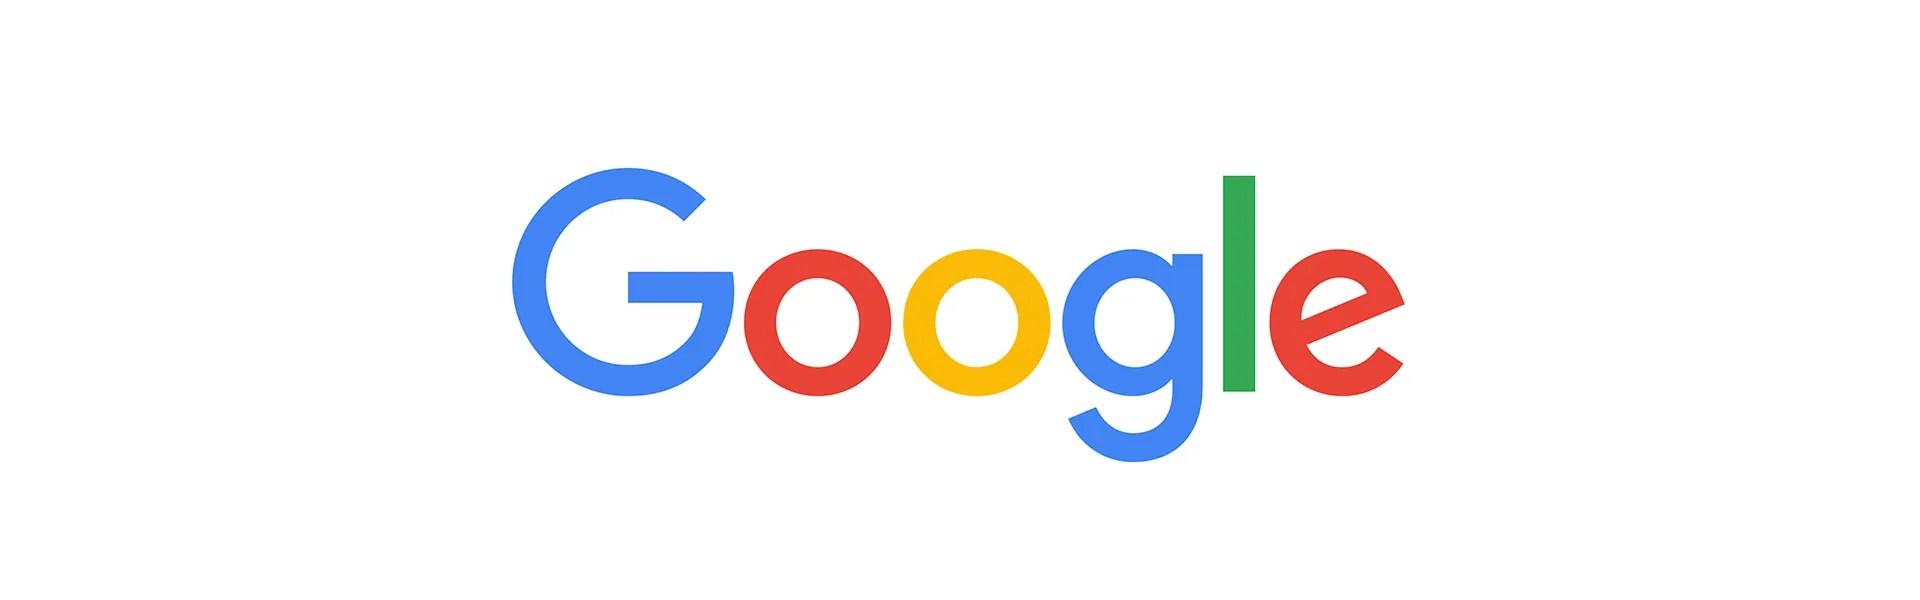 Google Logo 1920x600.png